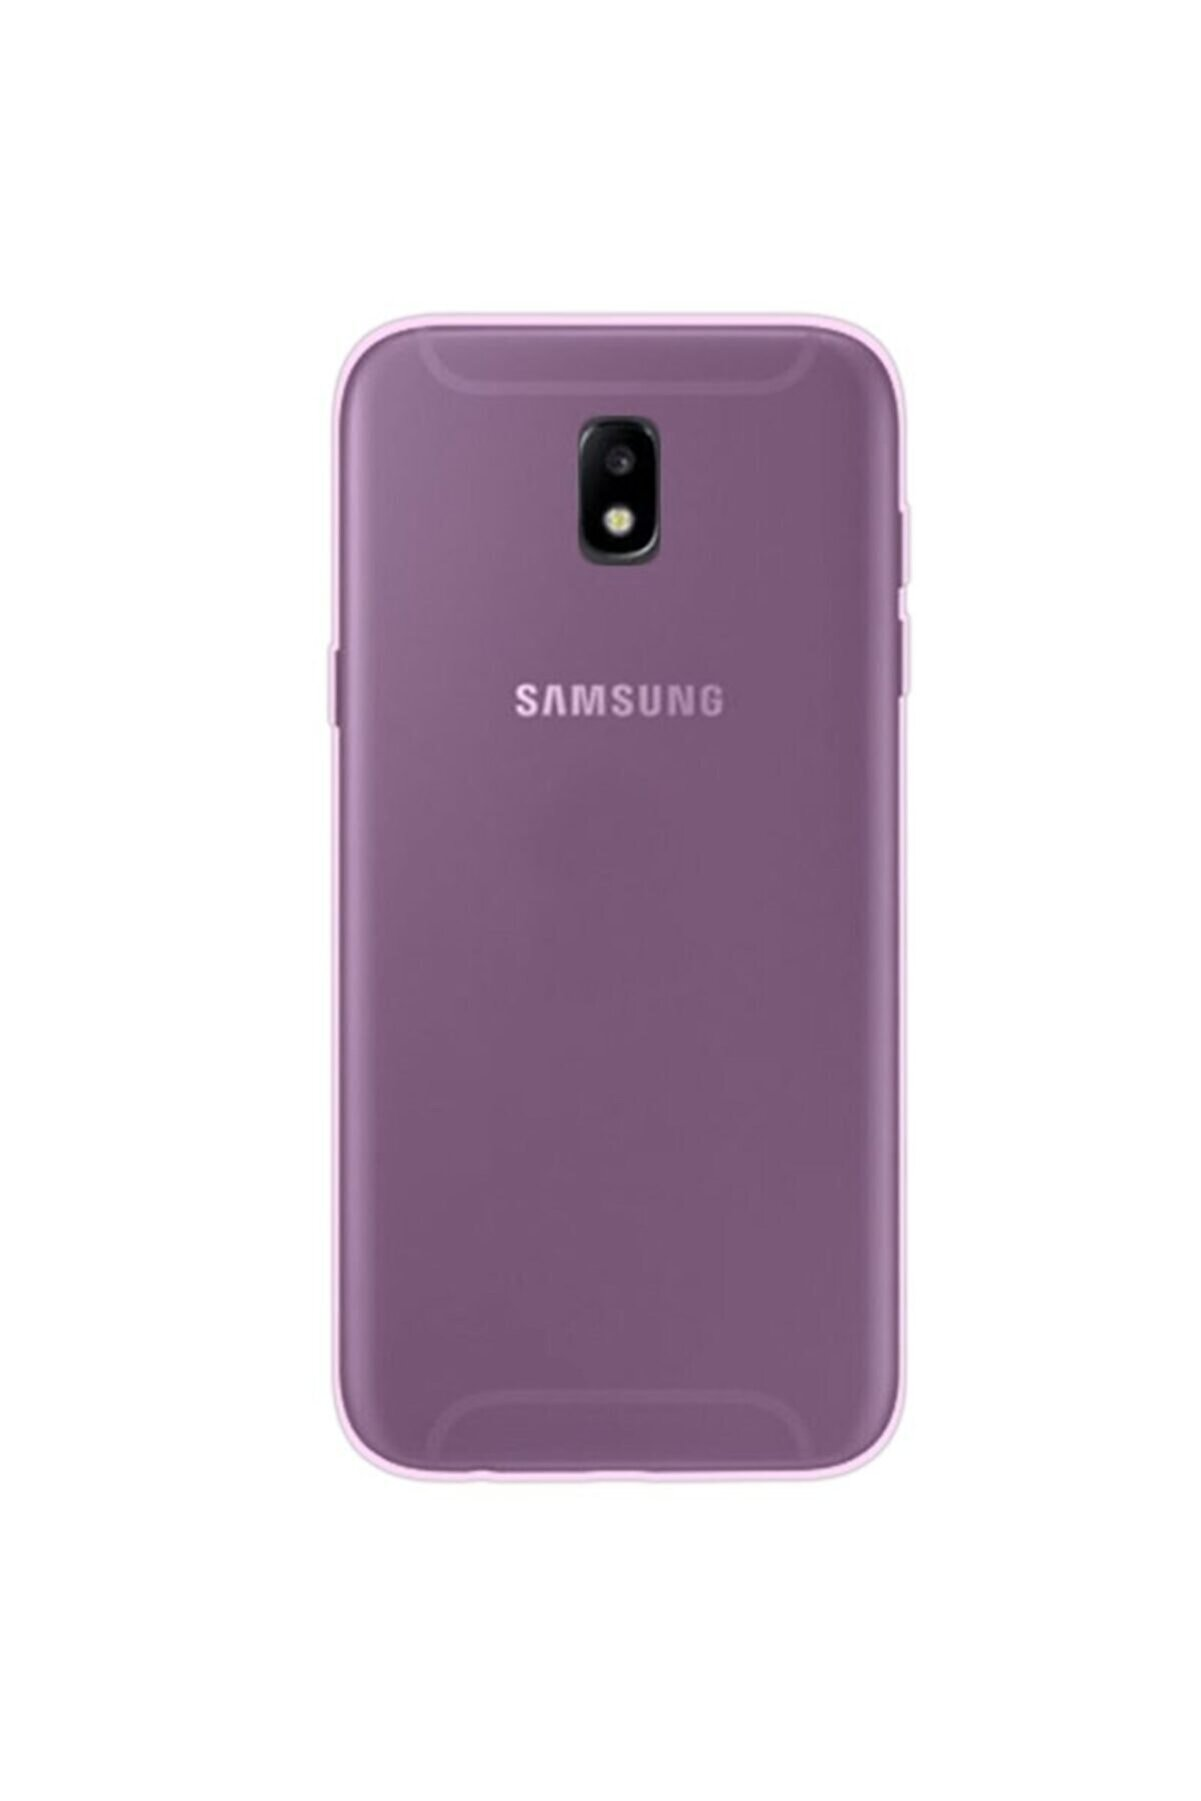 Samsung Nihcase Galaxy J3 Pro Thin Silicone Kılıf Pembe